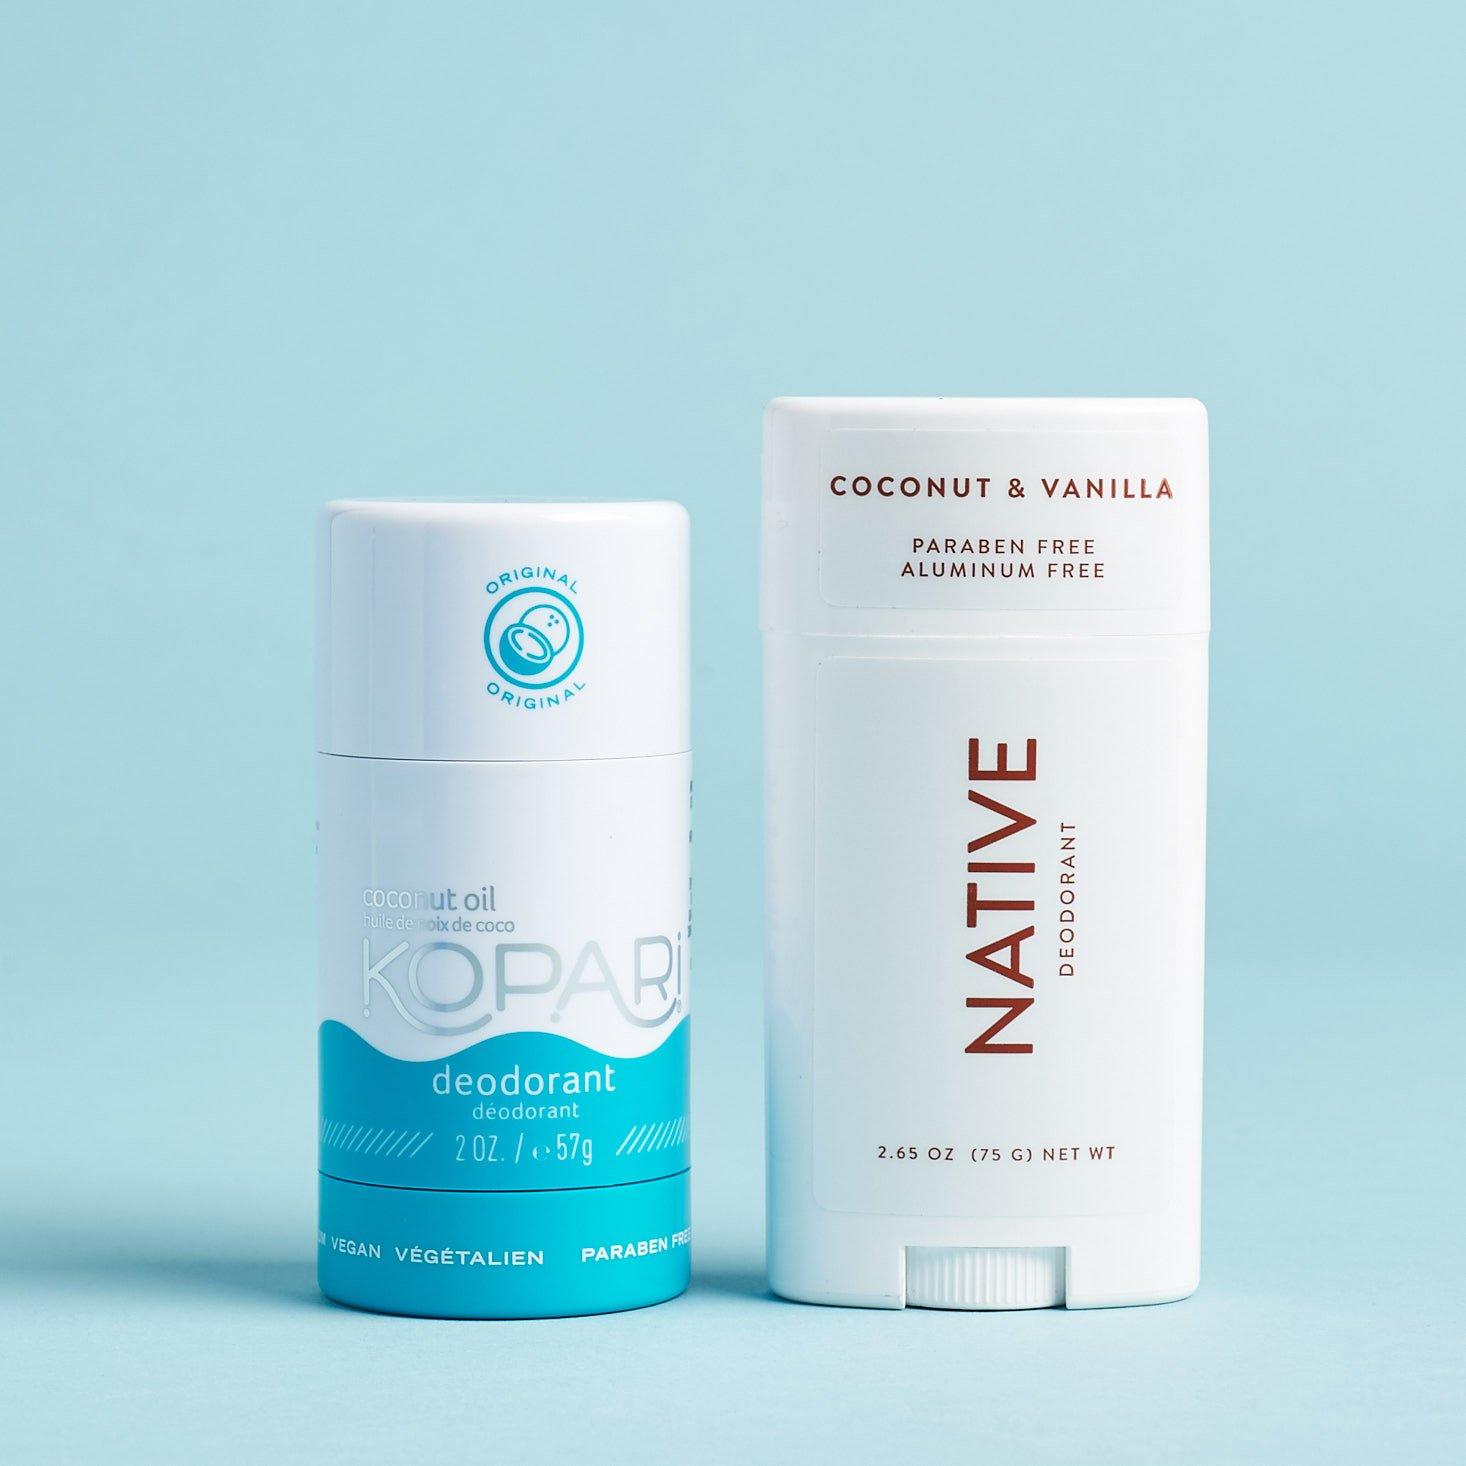 Kopari vs. Native—Comparing These Two Popular Natural Deodorants